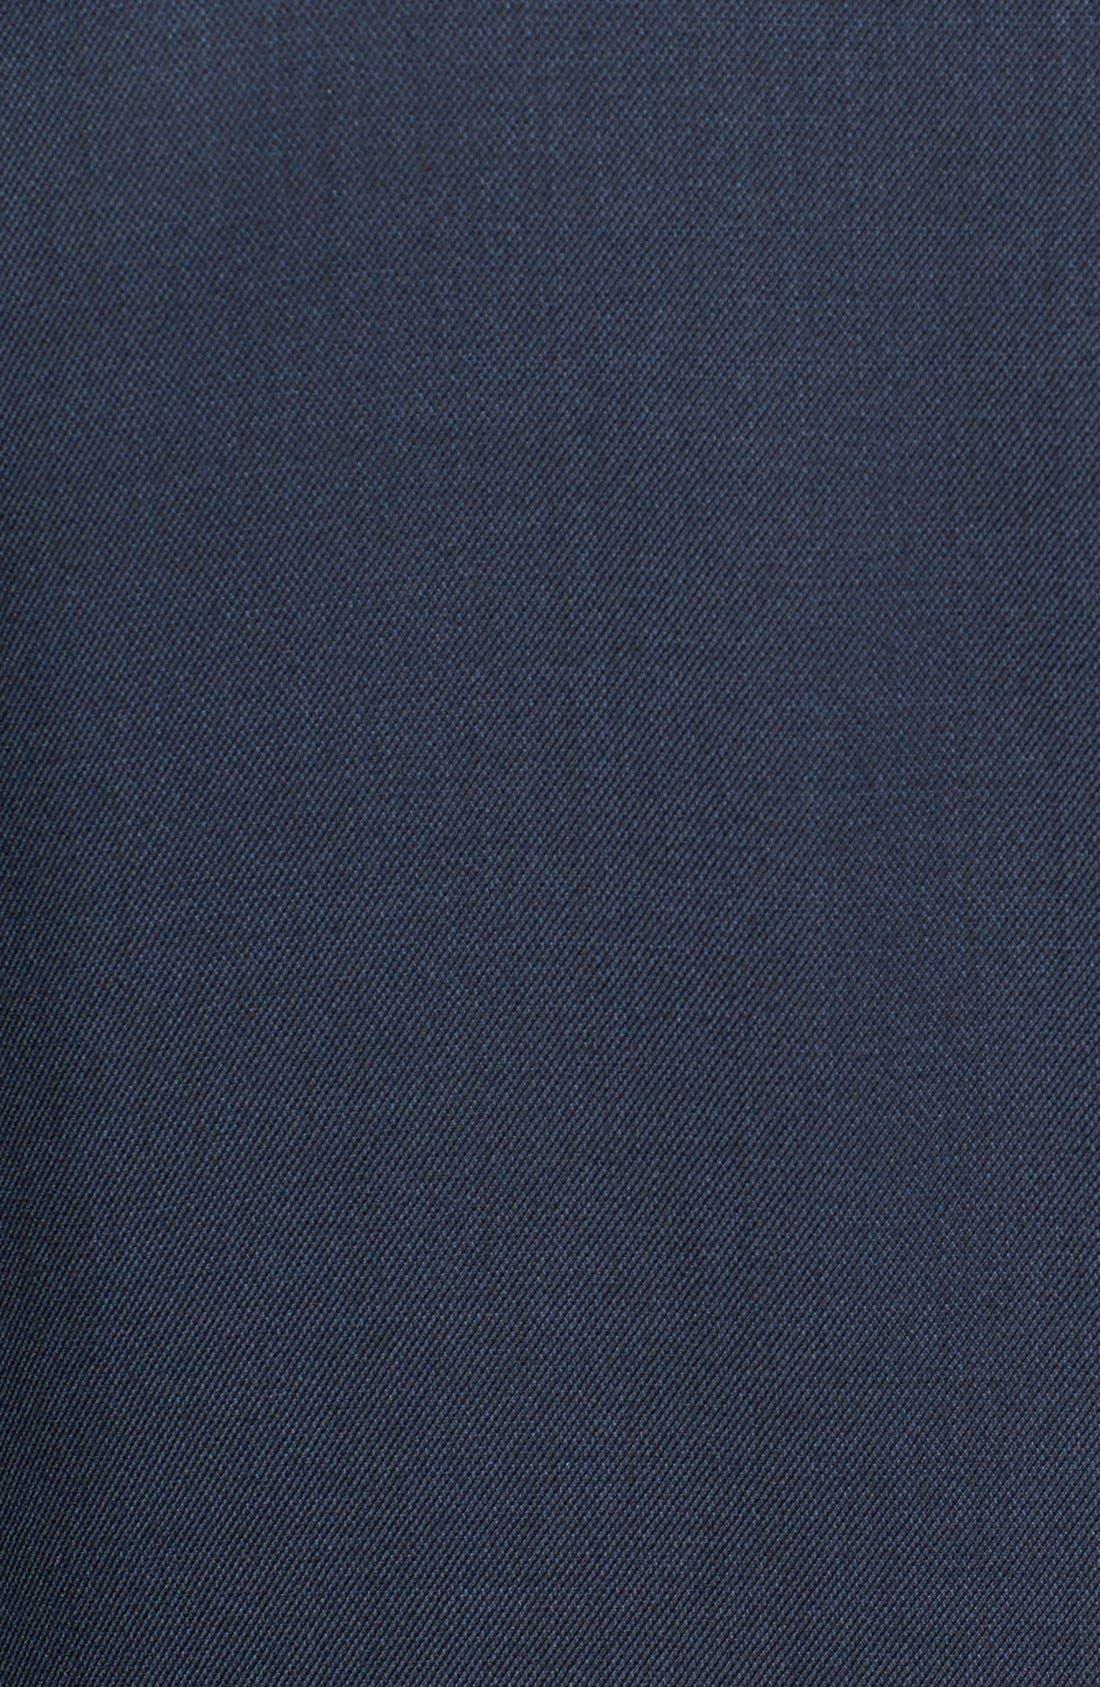 Alternate Image 6  - Ted Baker London Jones Trim Fit Solid Wool Suit